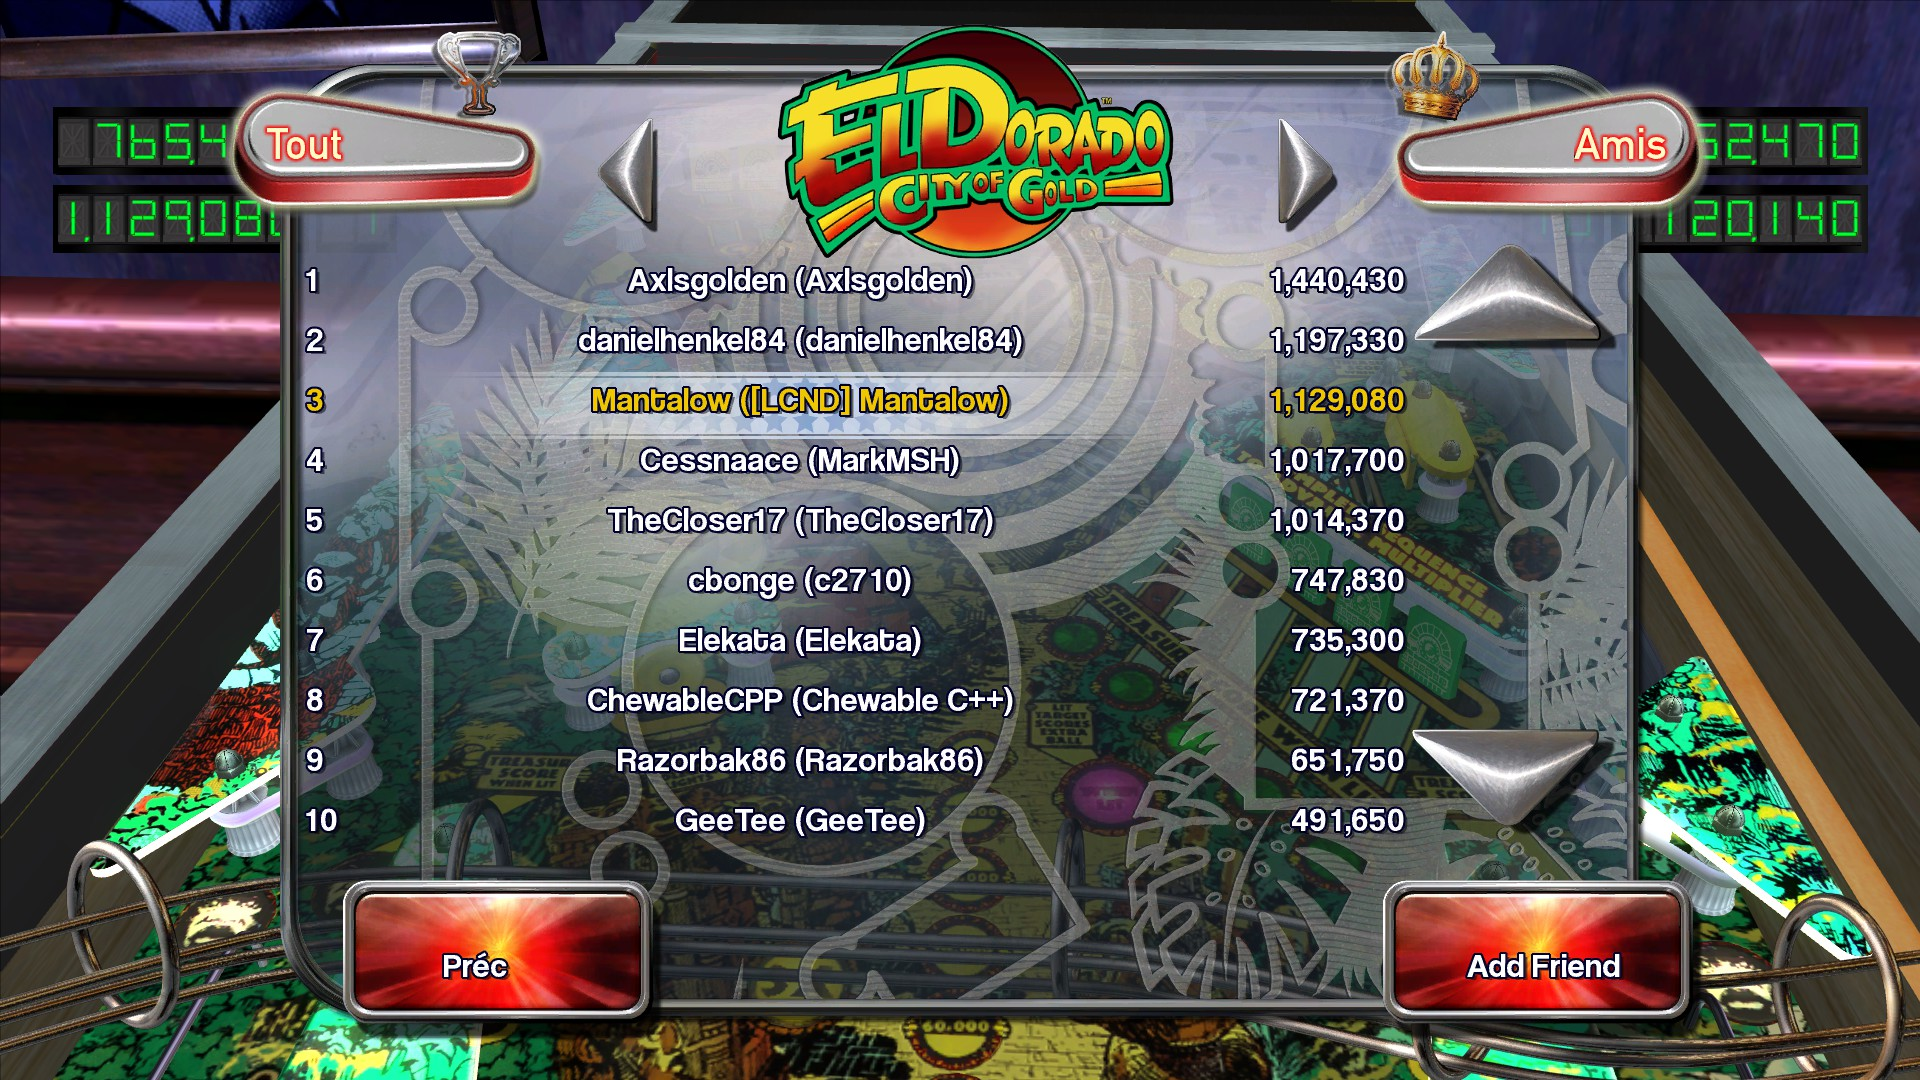 Mantalow: Pinball Arcade: El Dorado: City of Gold (PC) 1,129,080 points on 2015-07-01 16:06:50